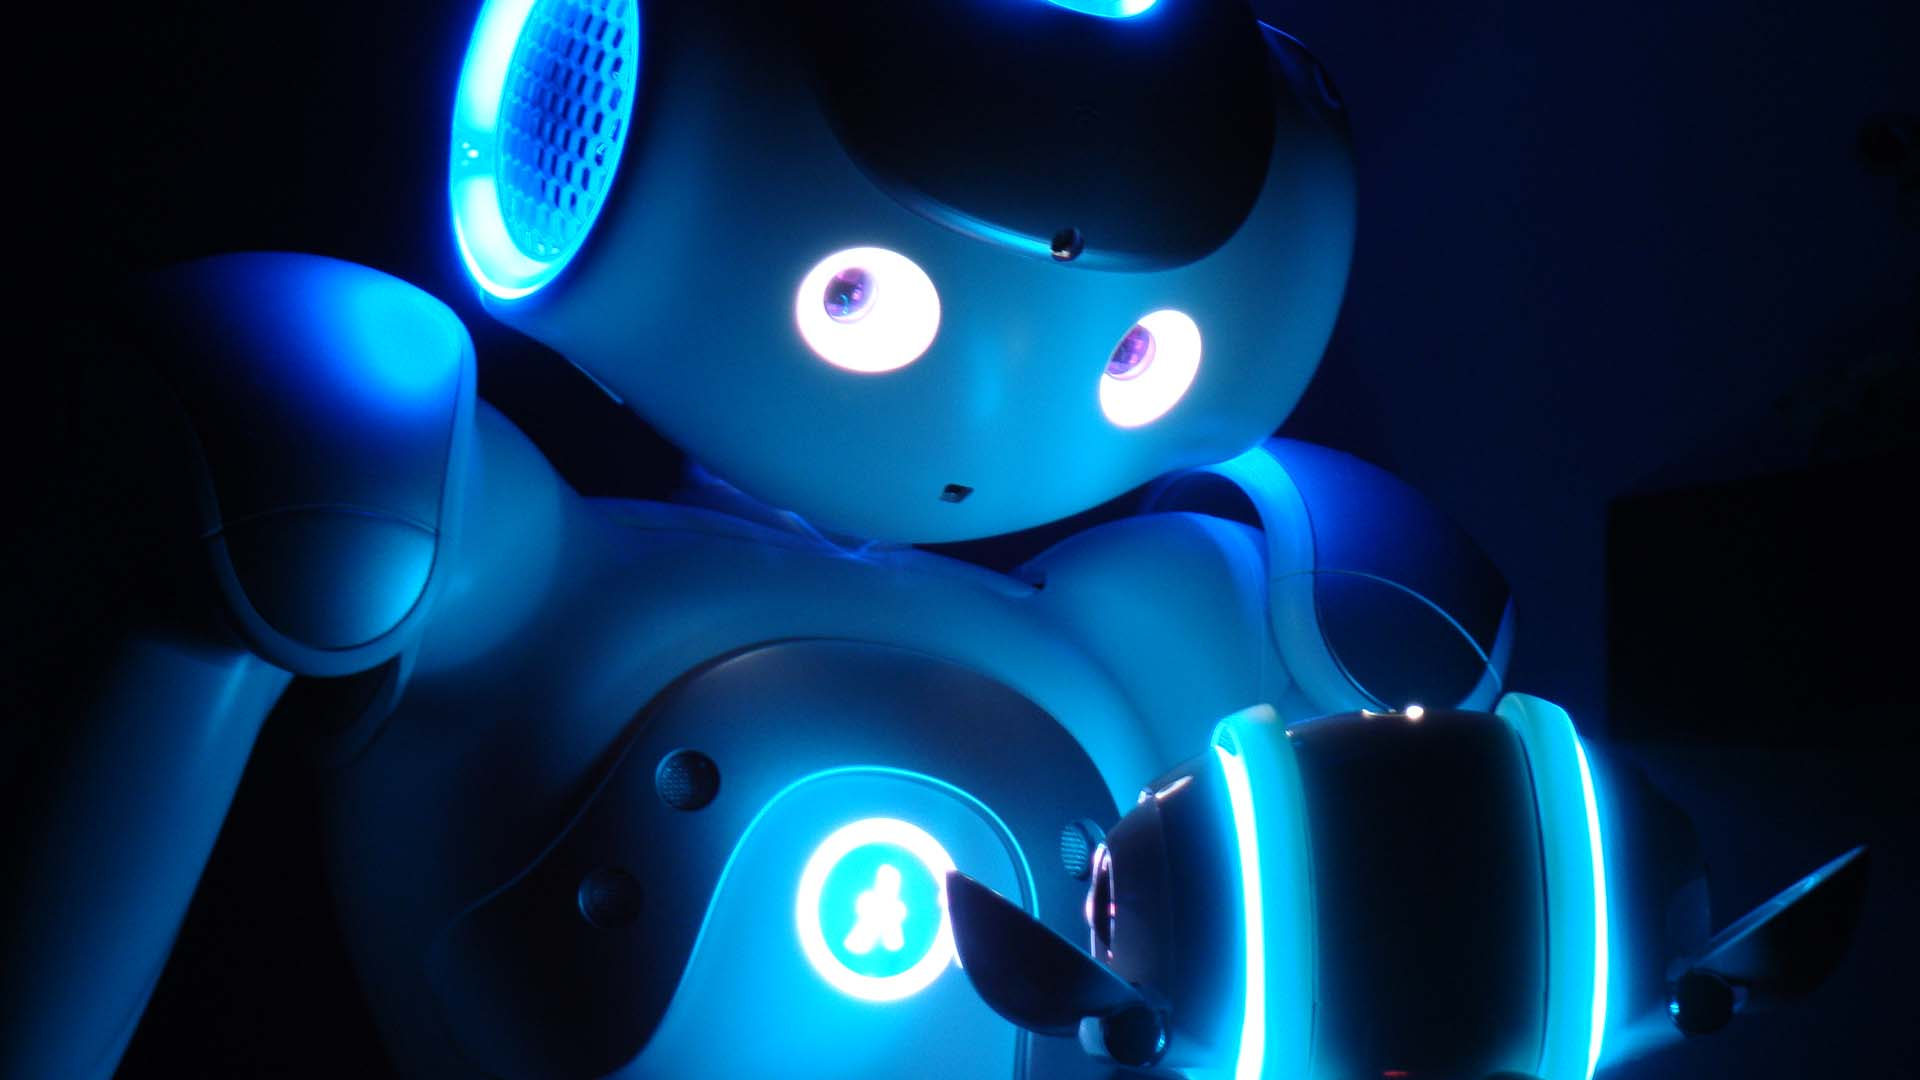 l u0026 39 ia watson d u0026 39 ibm fait danser le robot nao - tech